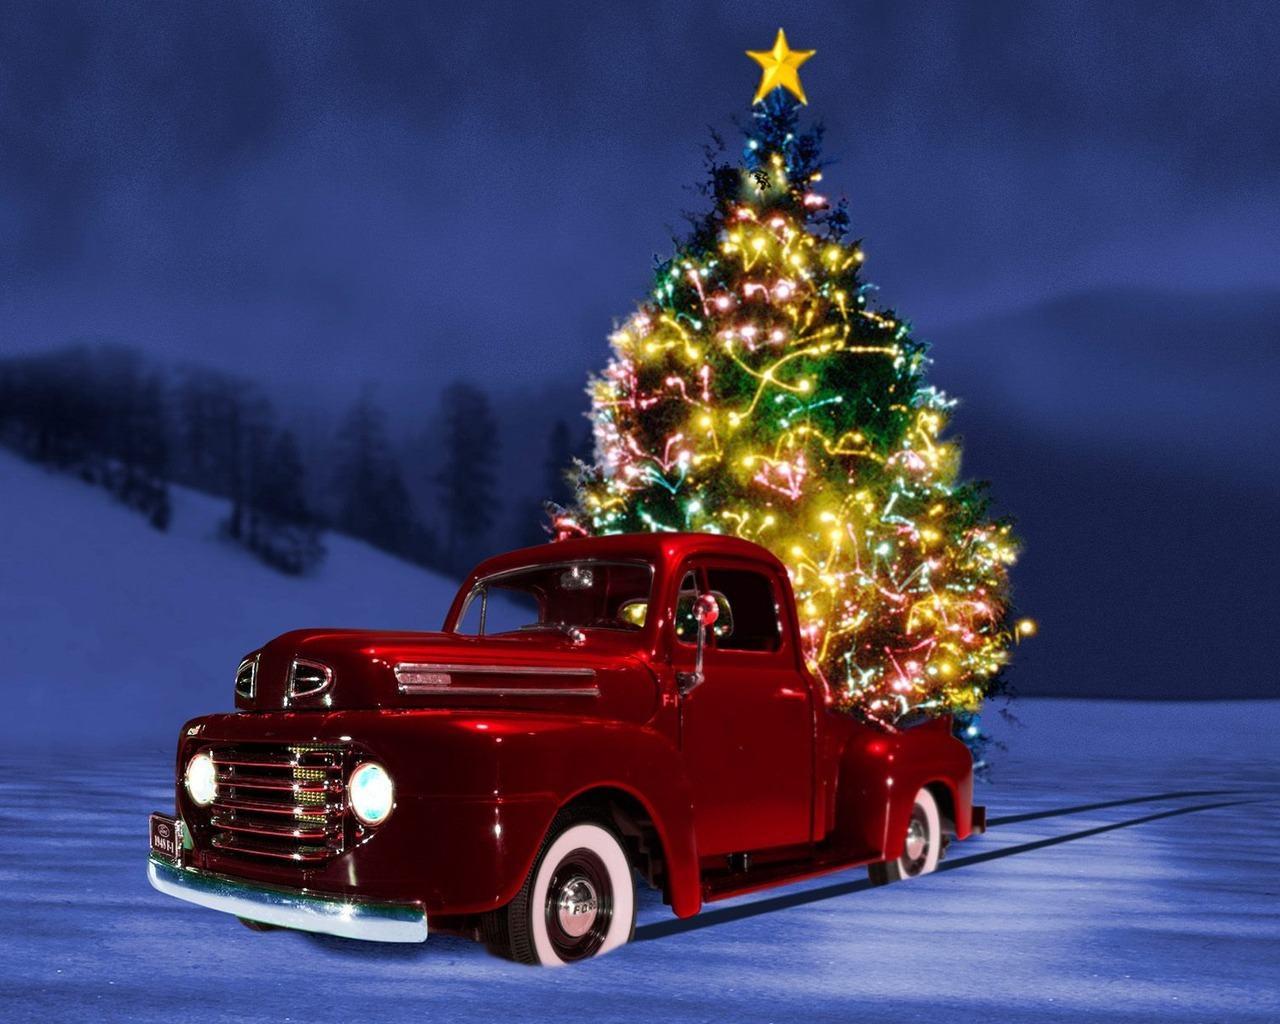 Free Christmas Wallpaper Backgrounds - WallpaperSafari